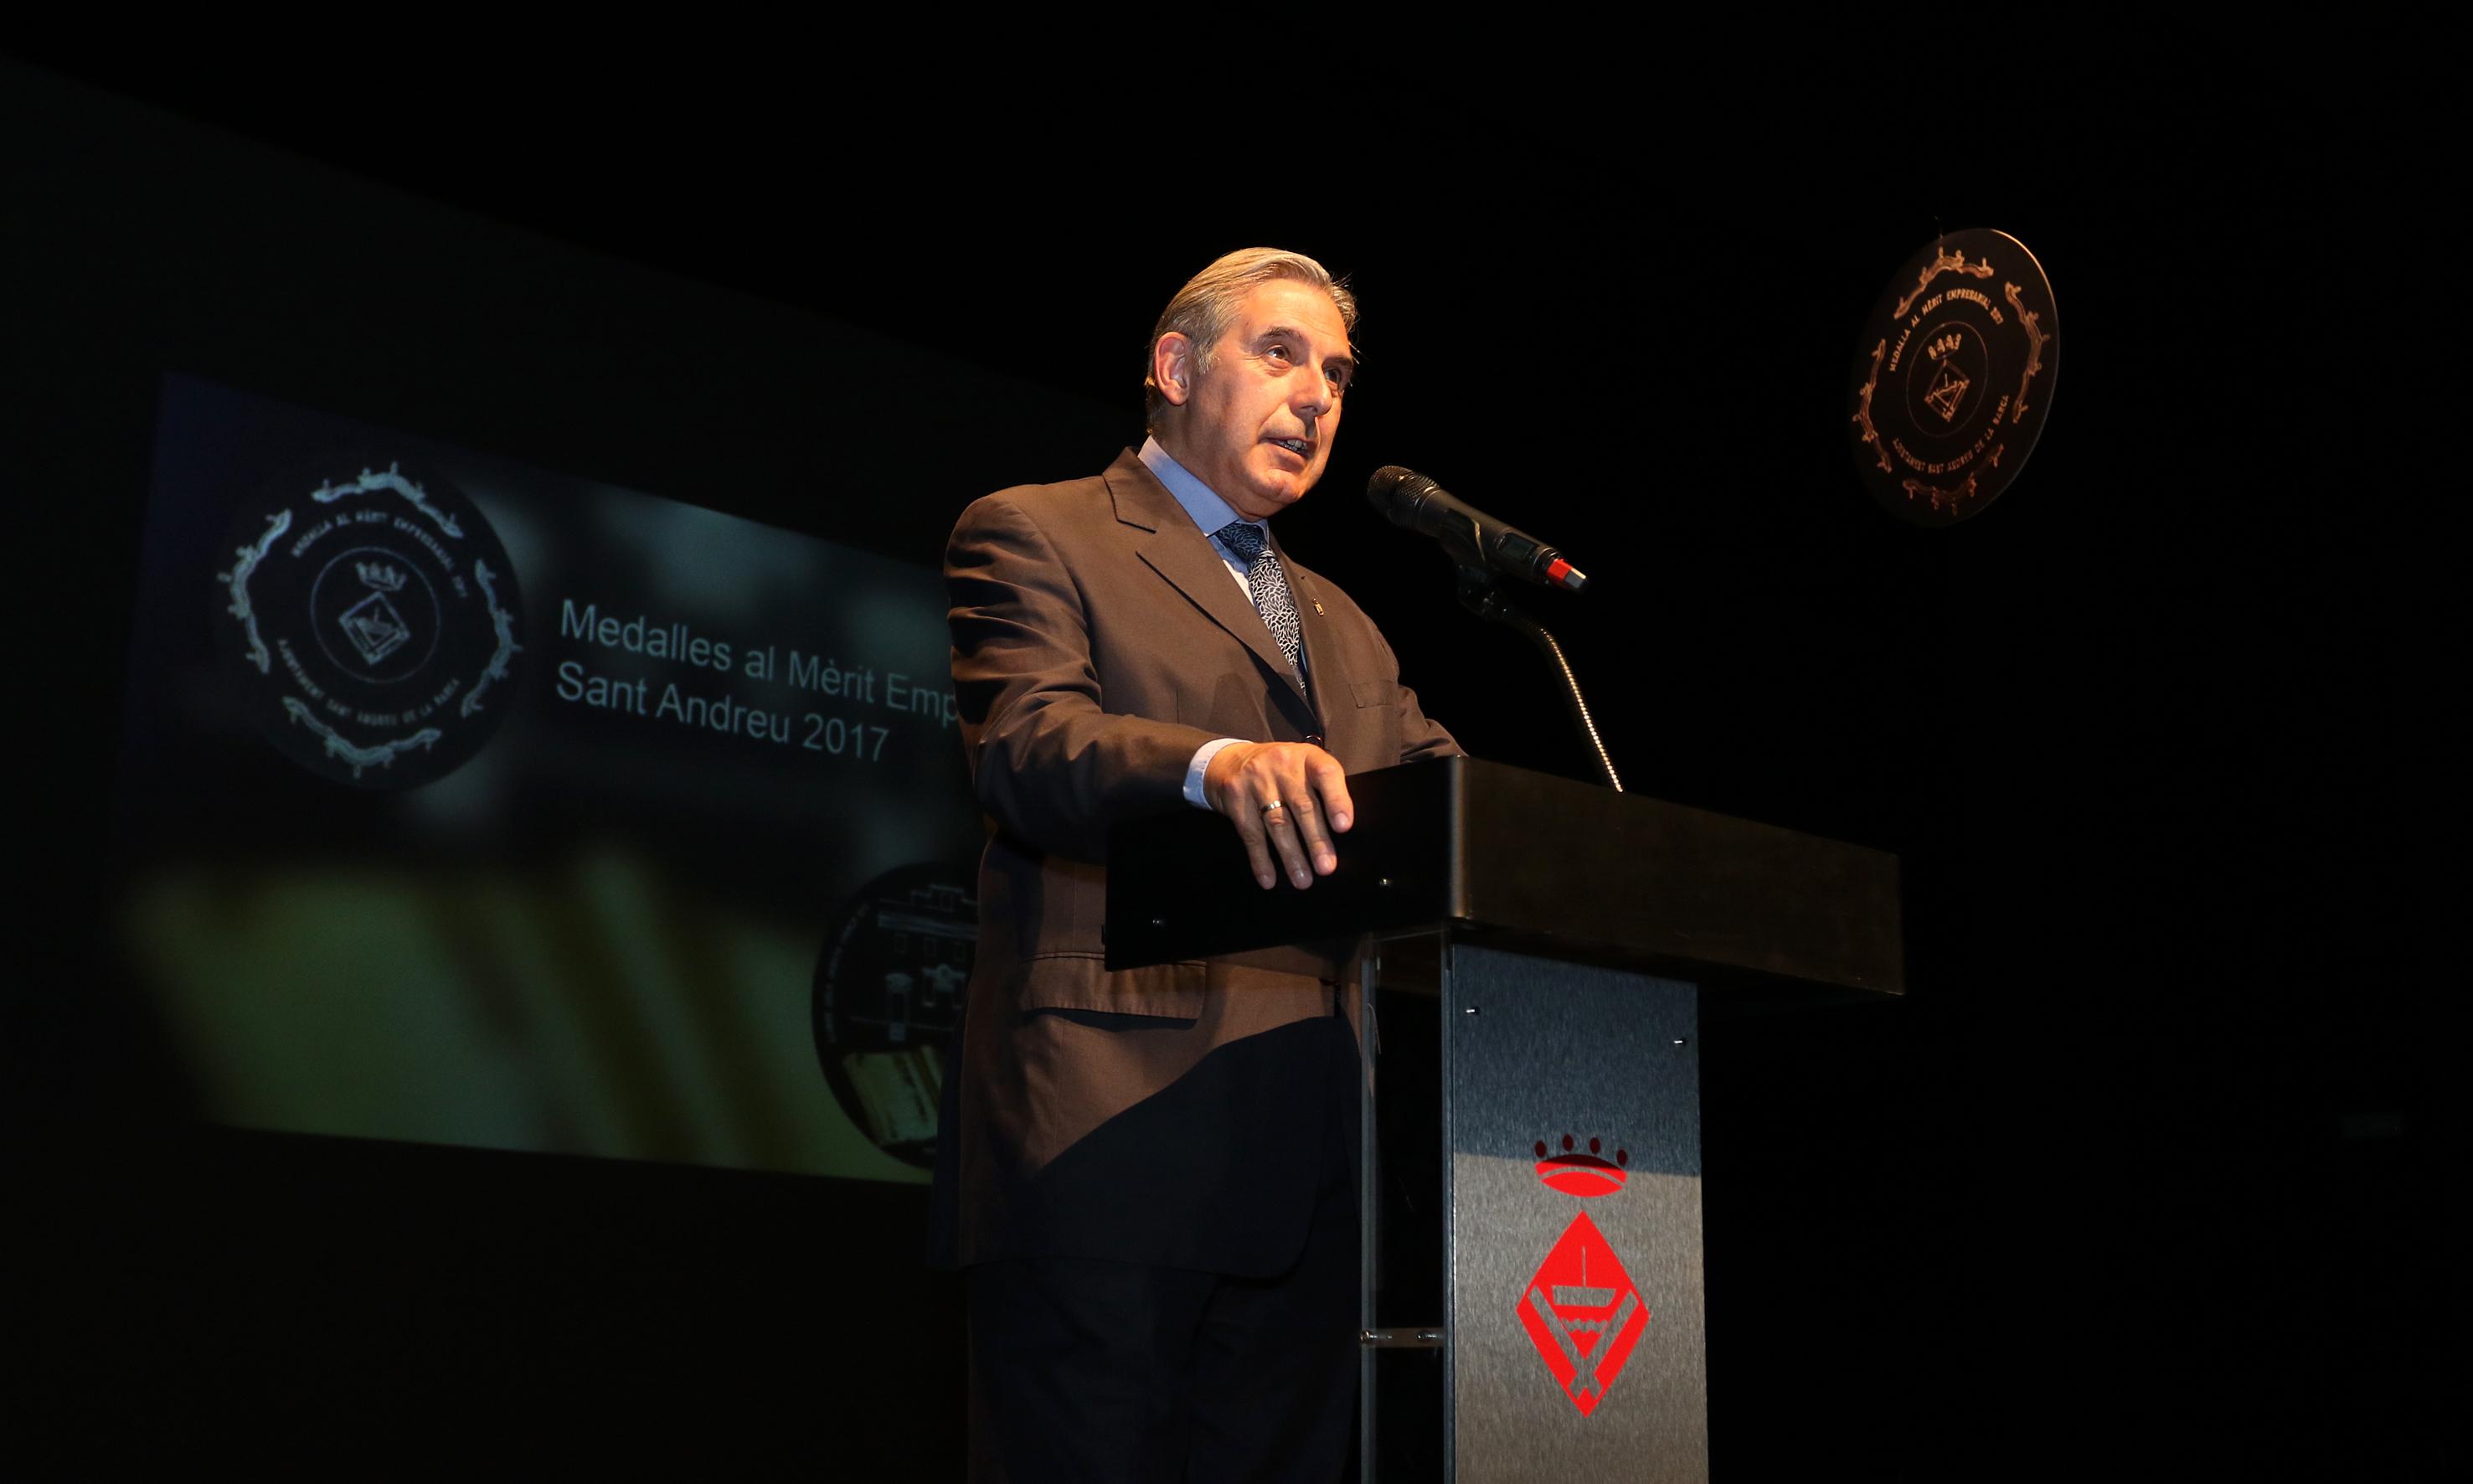 Medalles Mèrit empresarial 2017